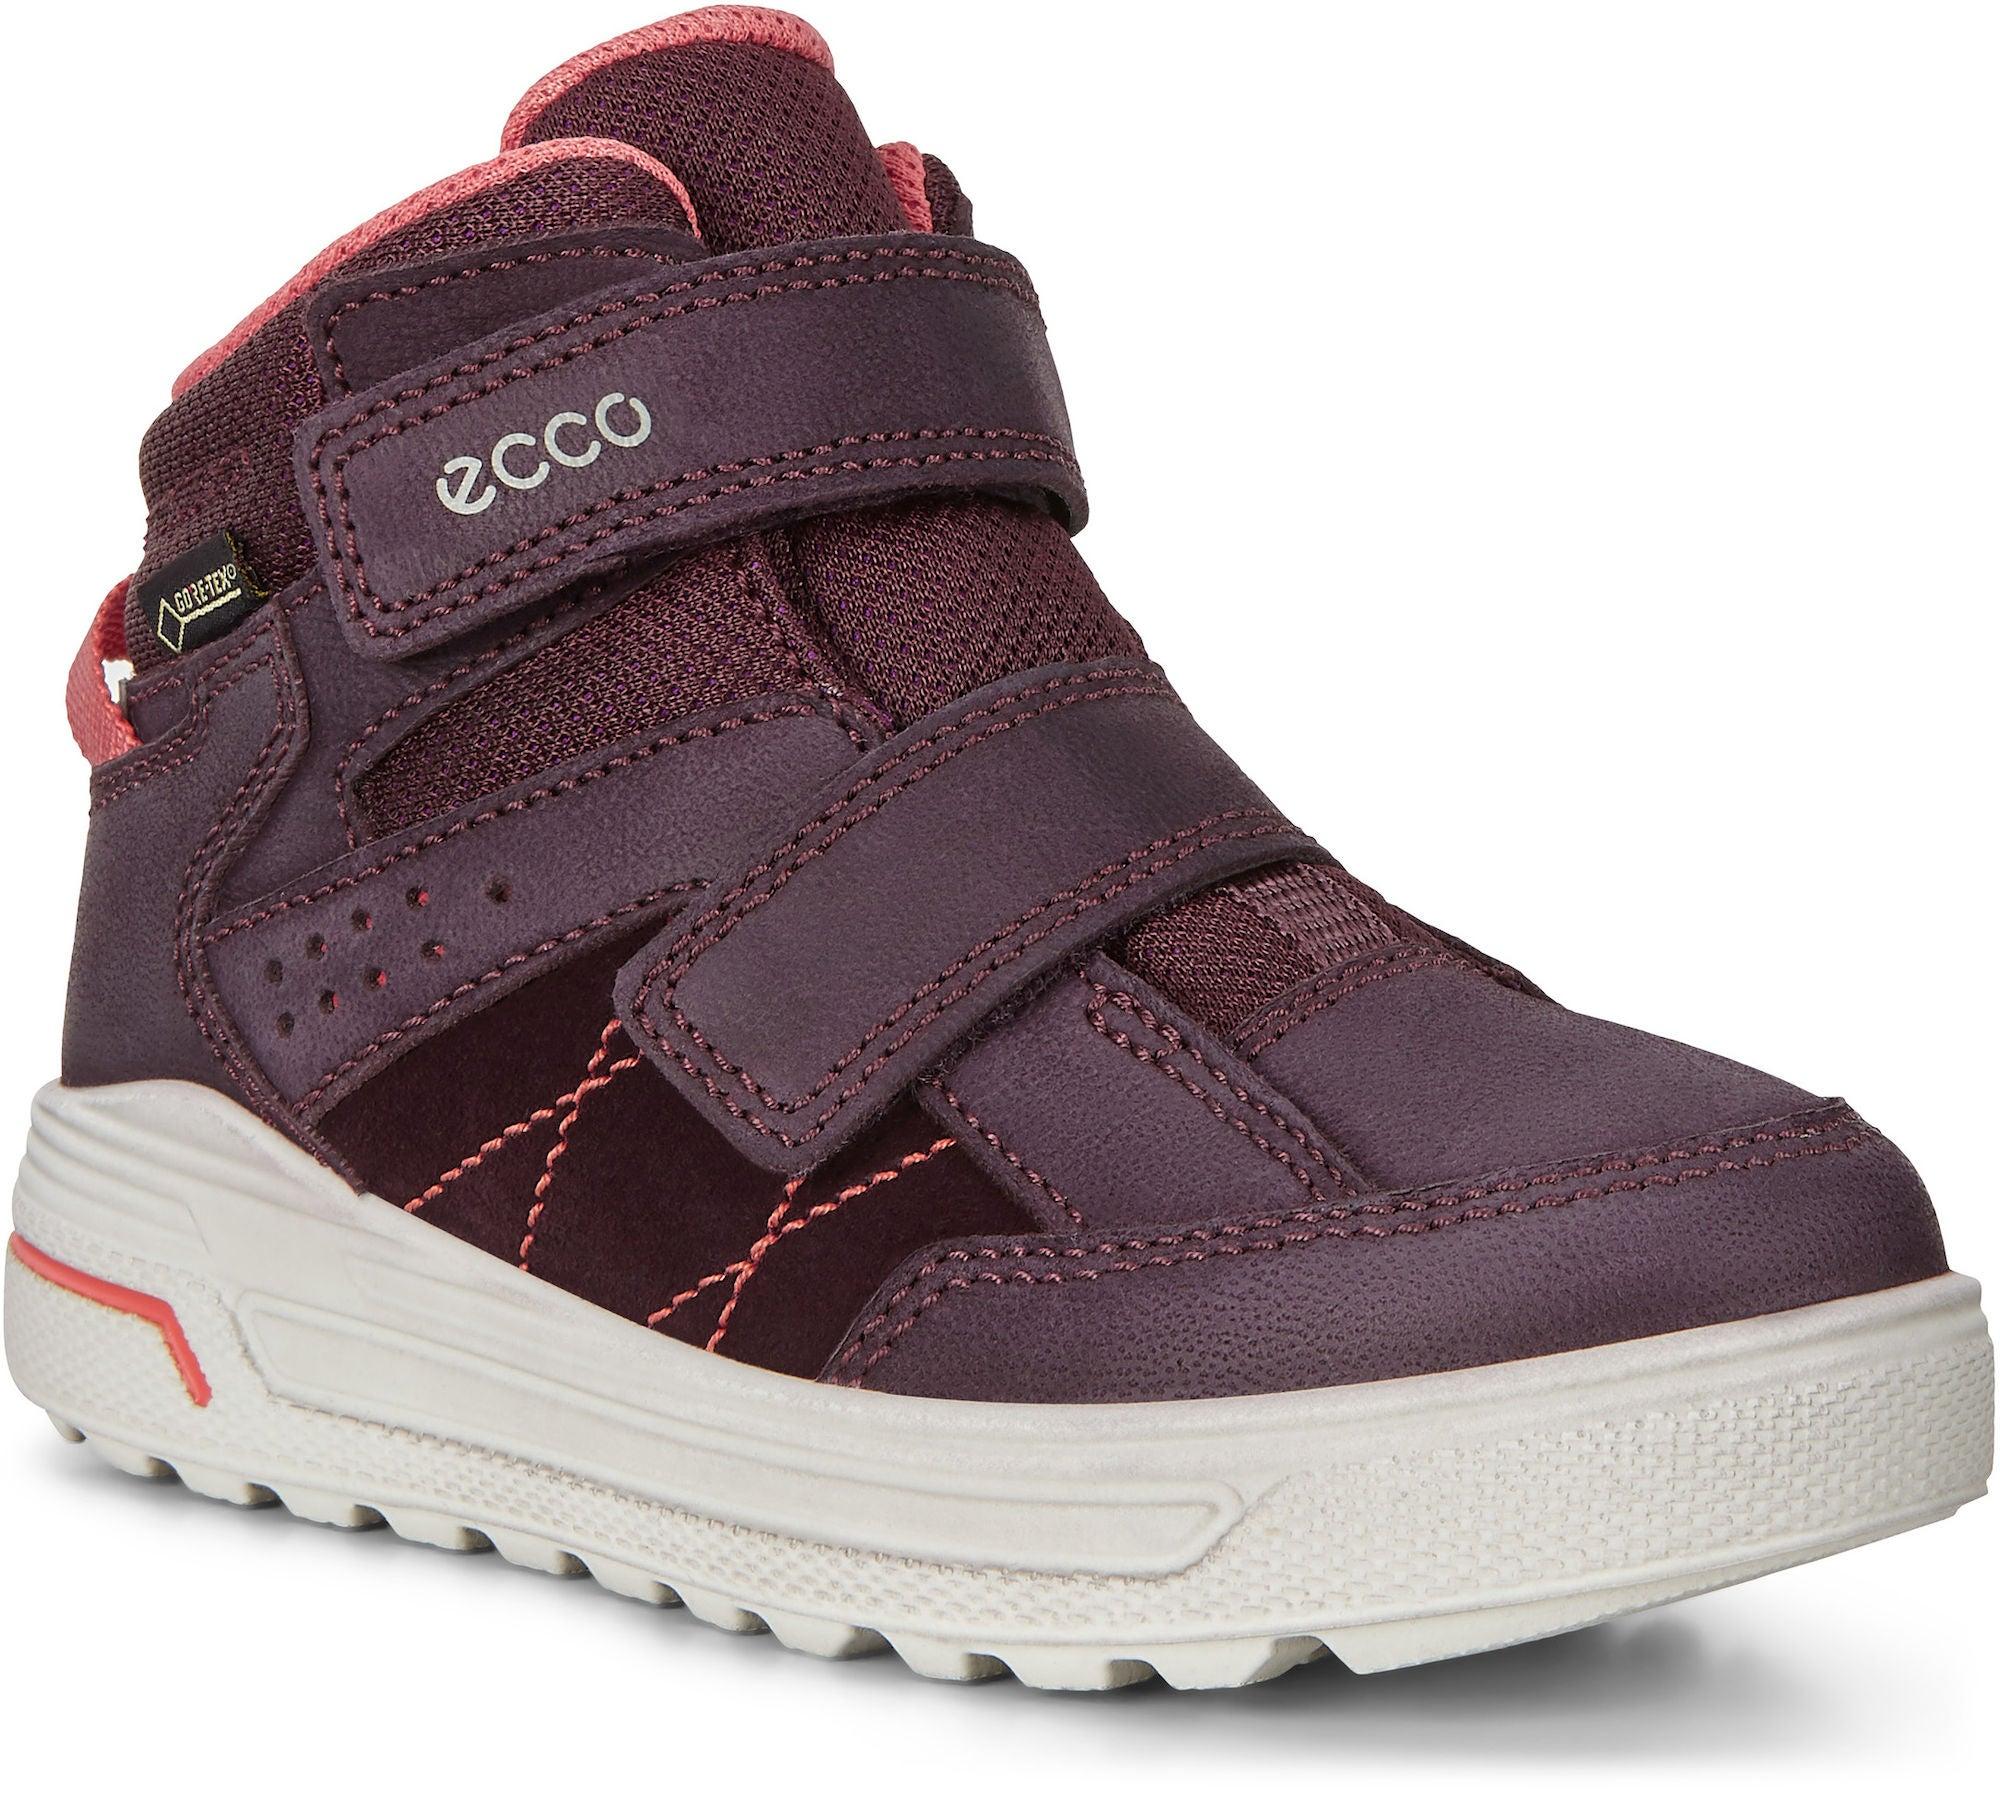 Kjøp ECCO Urban Snowboarder Boots GORE TEX, FigApricot